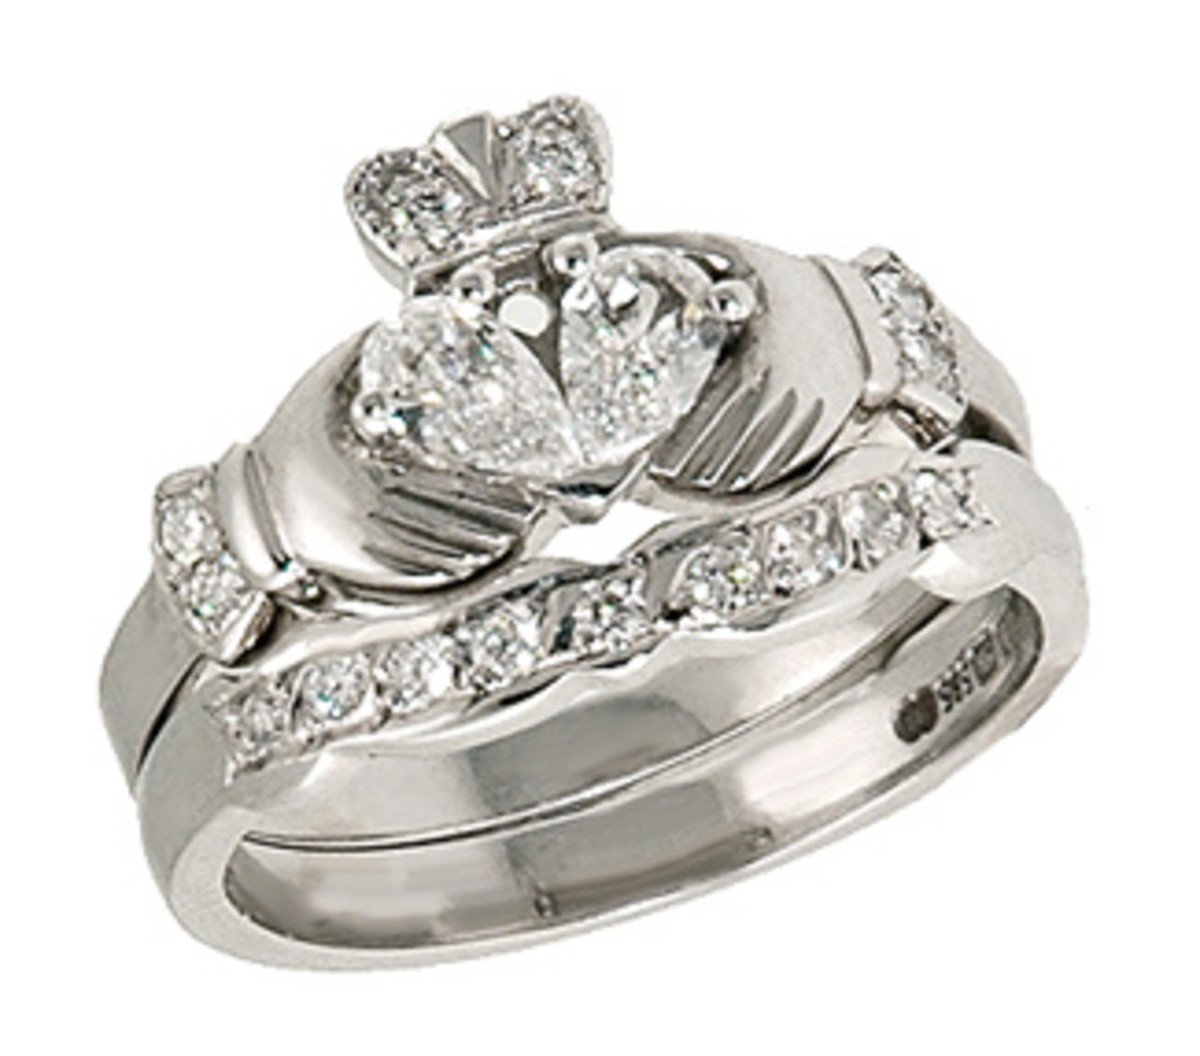 The Claddagh Wedding Ring Style